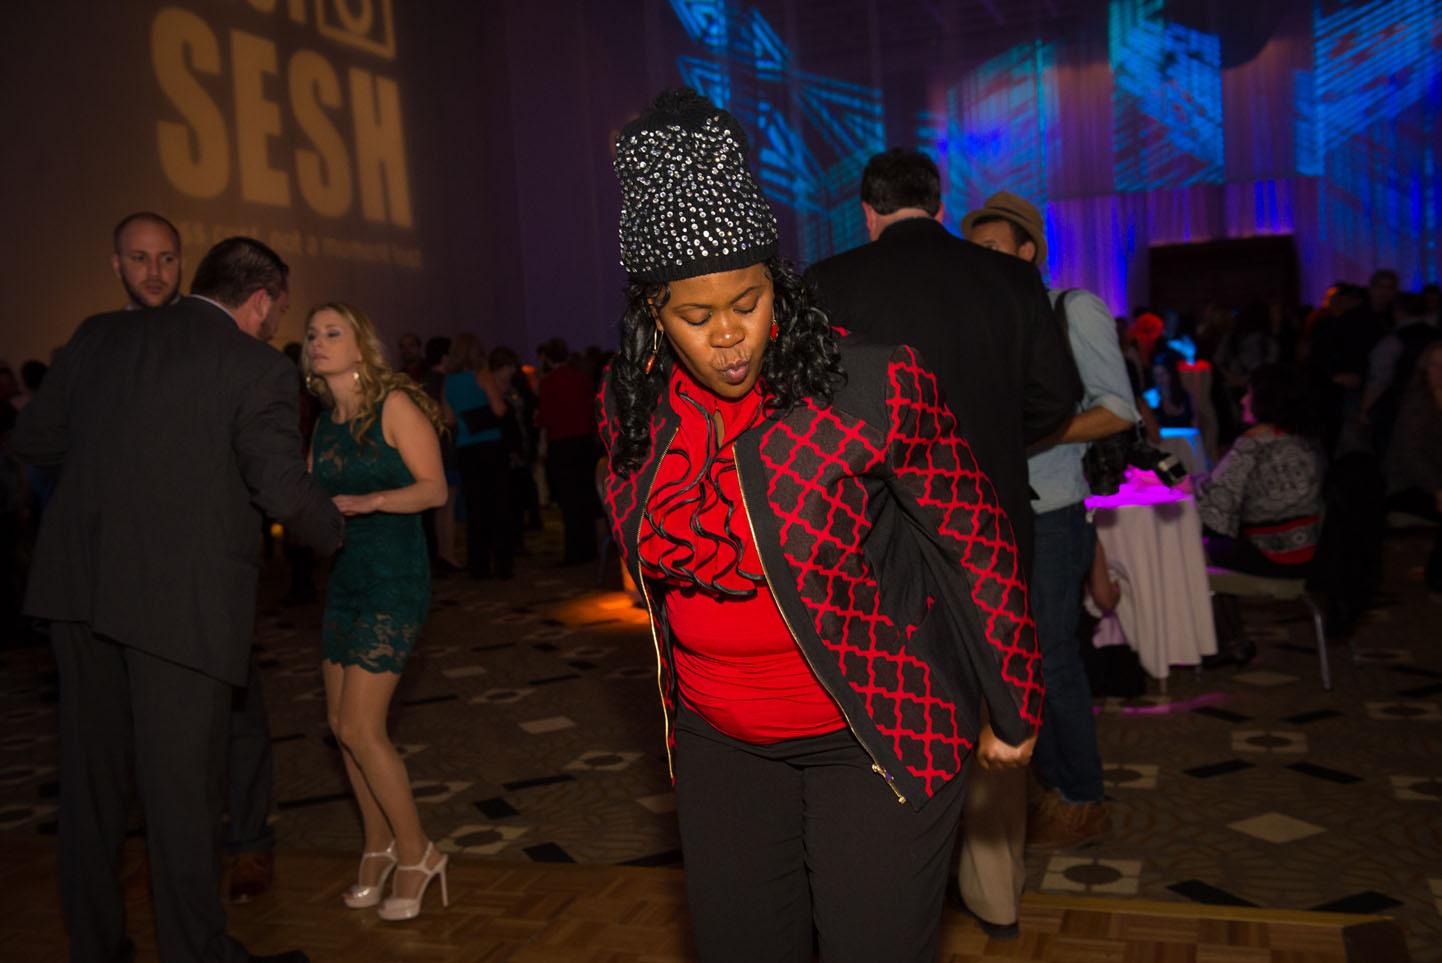 2015-12-09 ReMax Corpoarte Event - The Borgata - Atlantic City NJ - Photo Sesh - 2015-5111.jpg